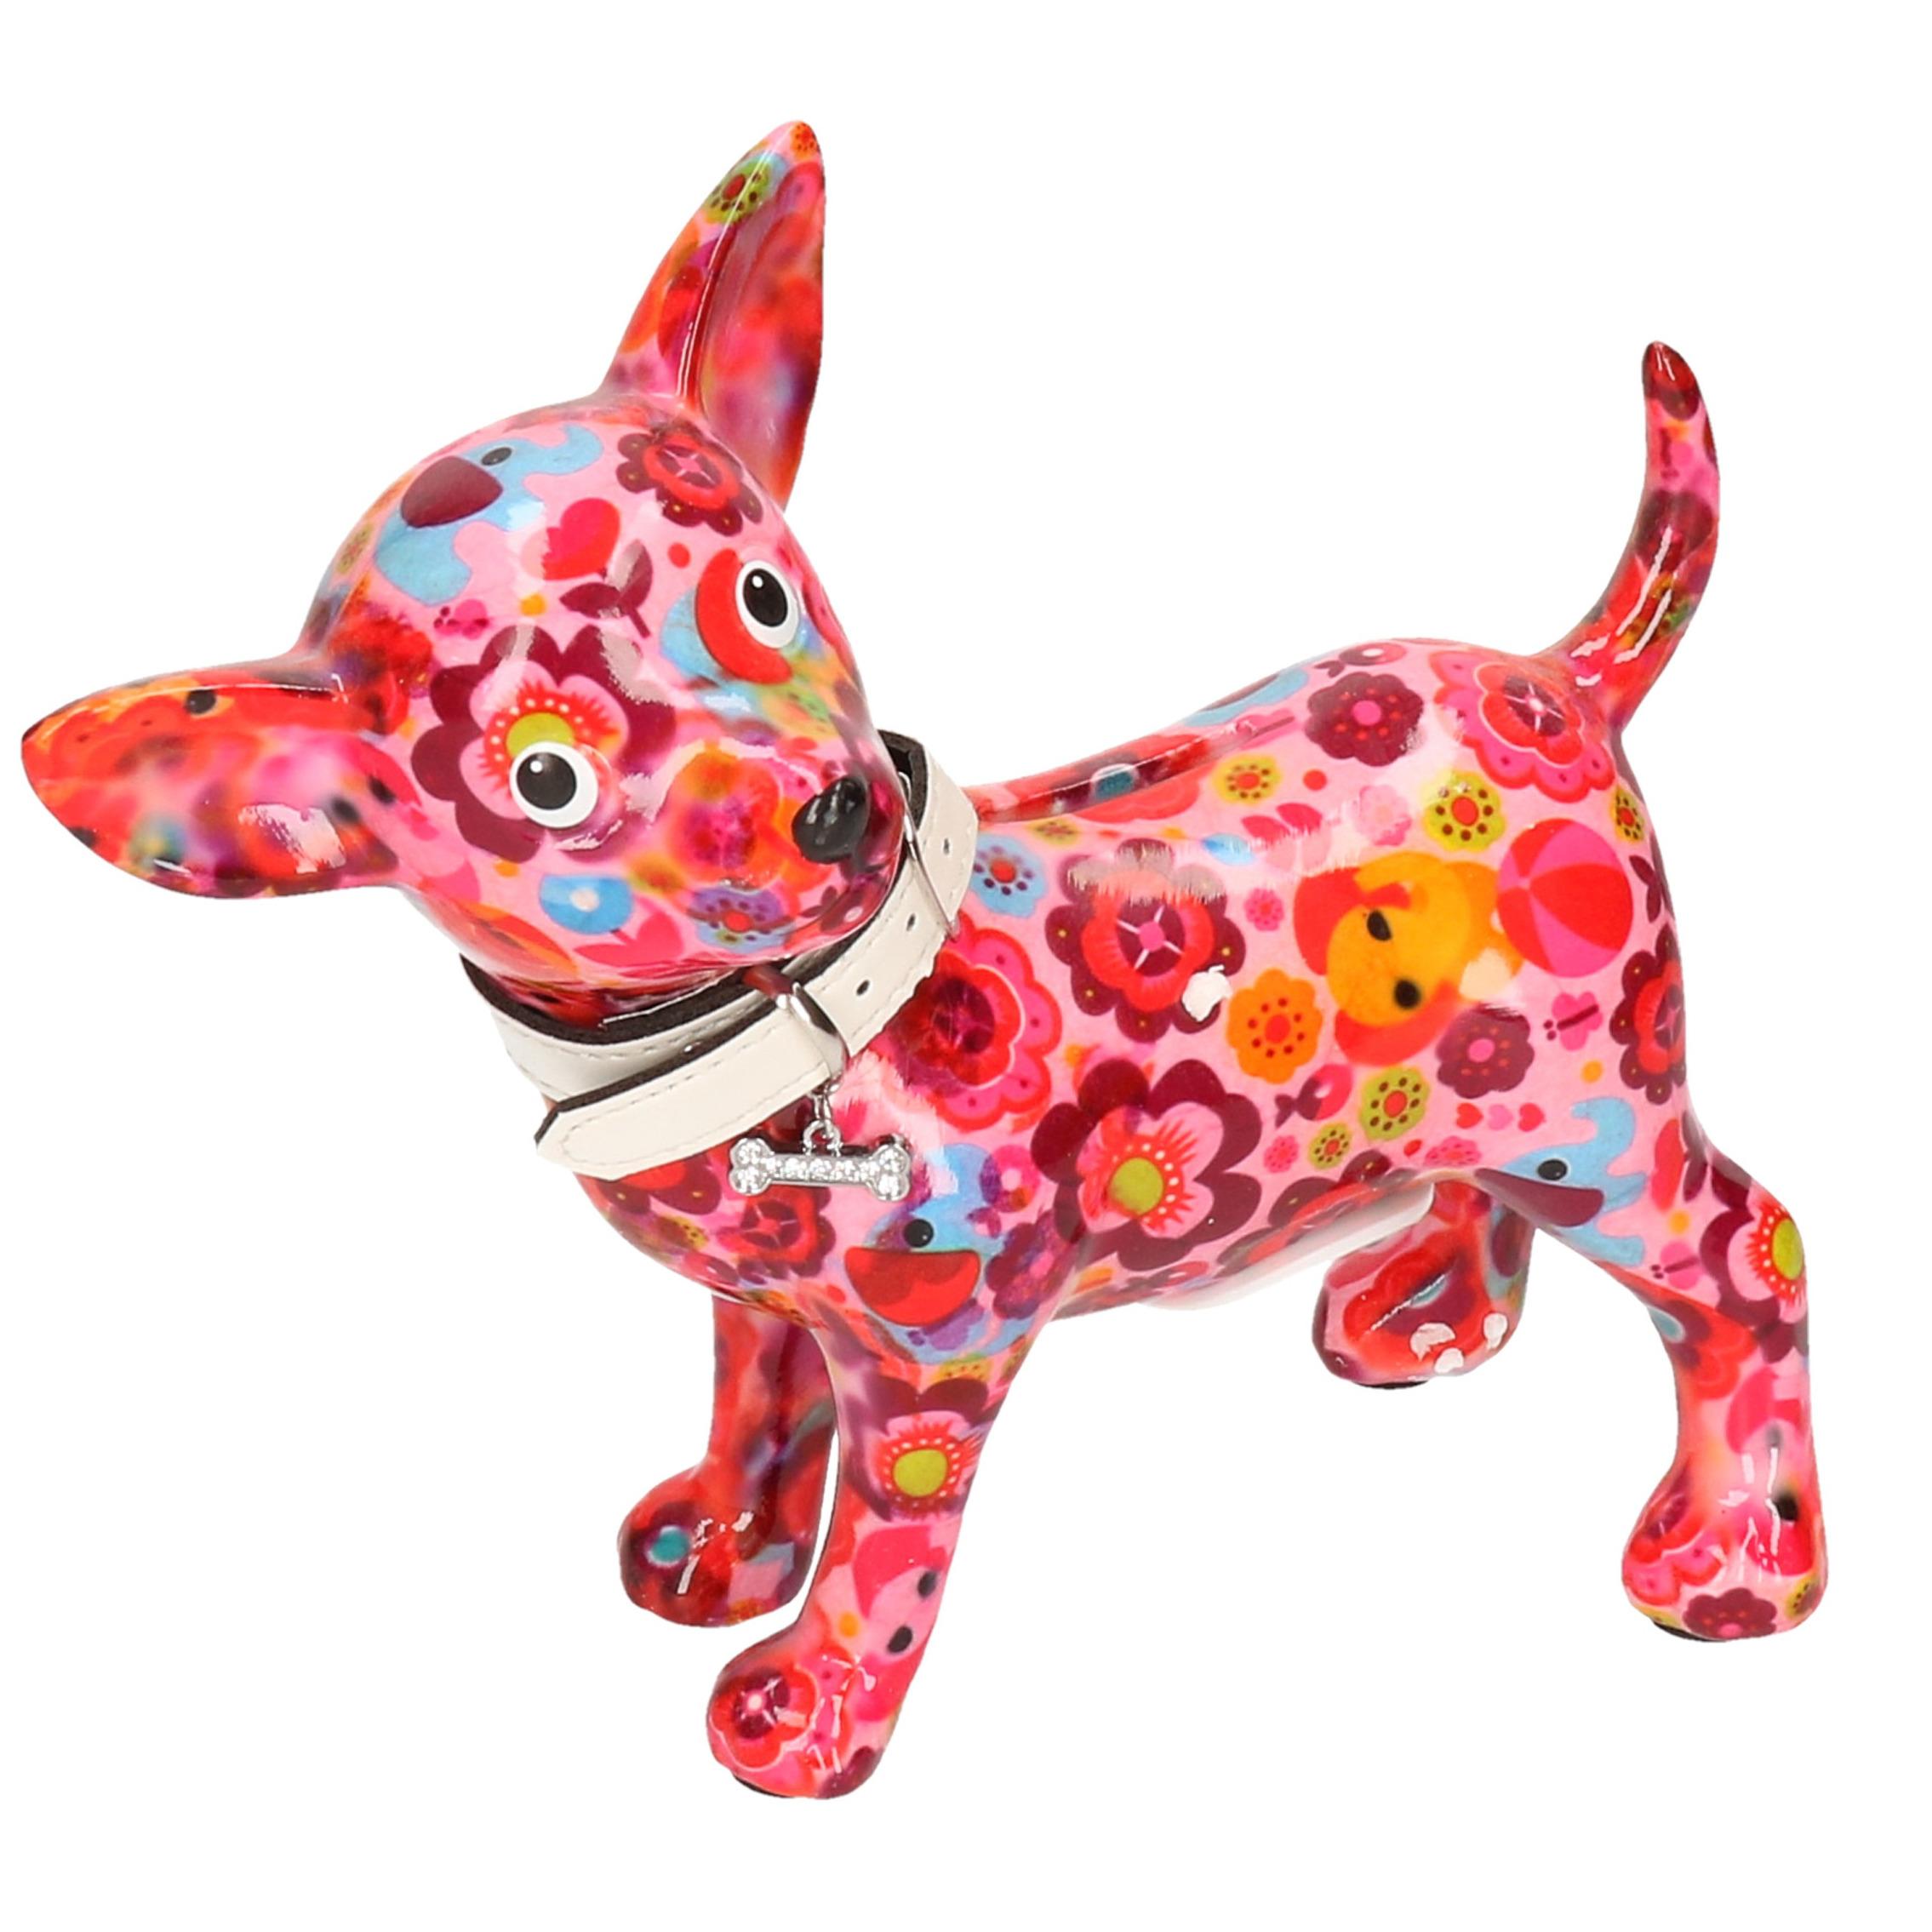 Spaarpot chihuahua hond roze met olifant en bloemen 21 cm